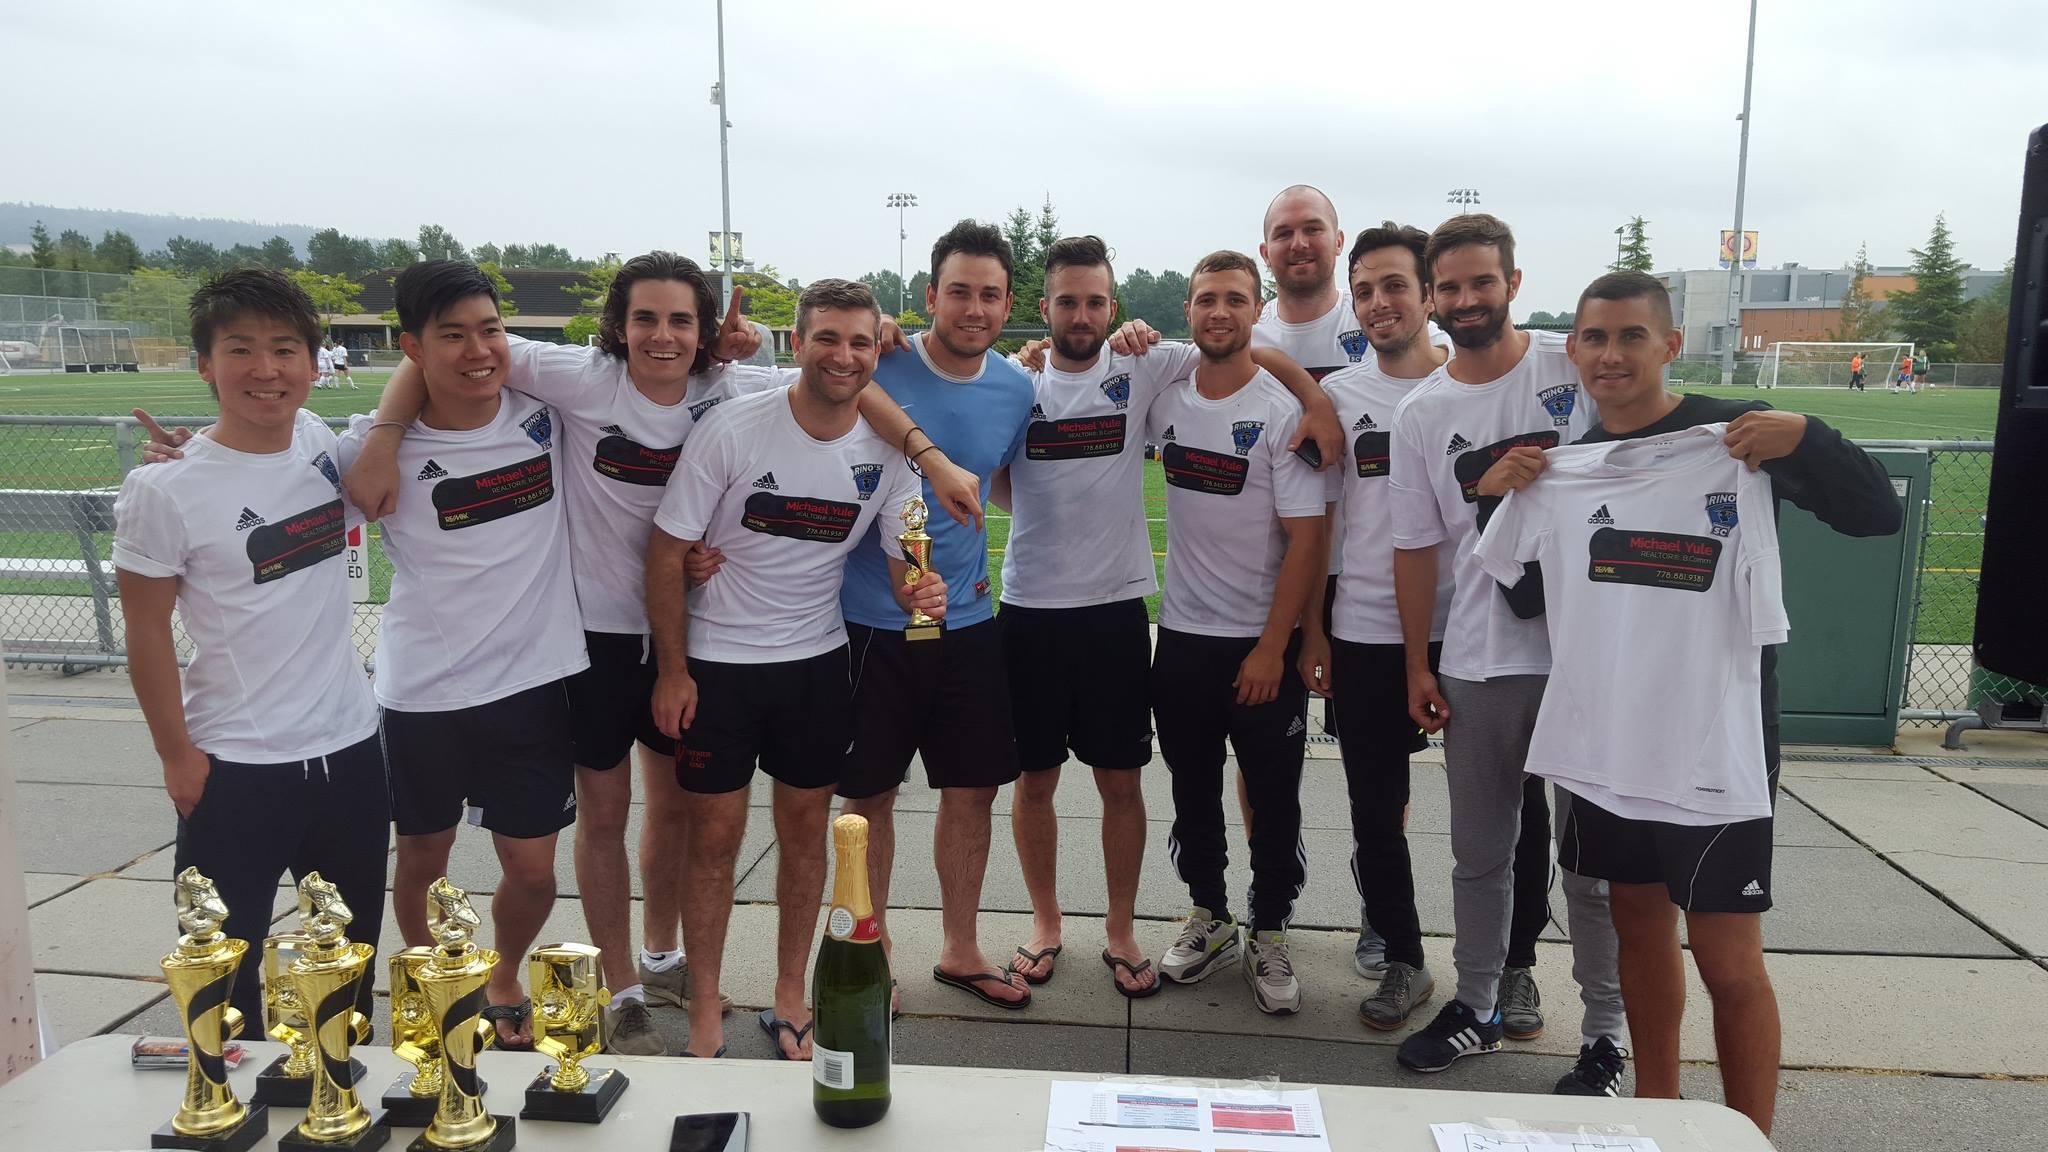 team_awarded_trophy